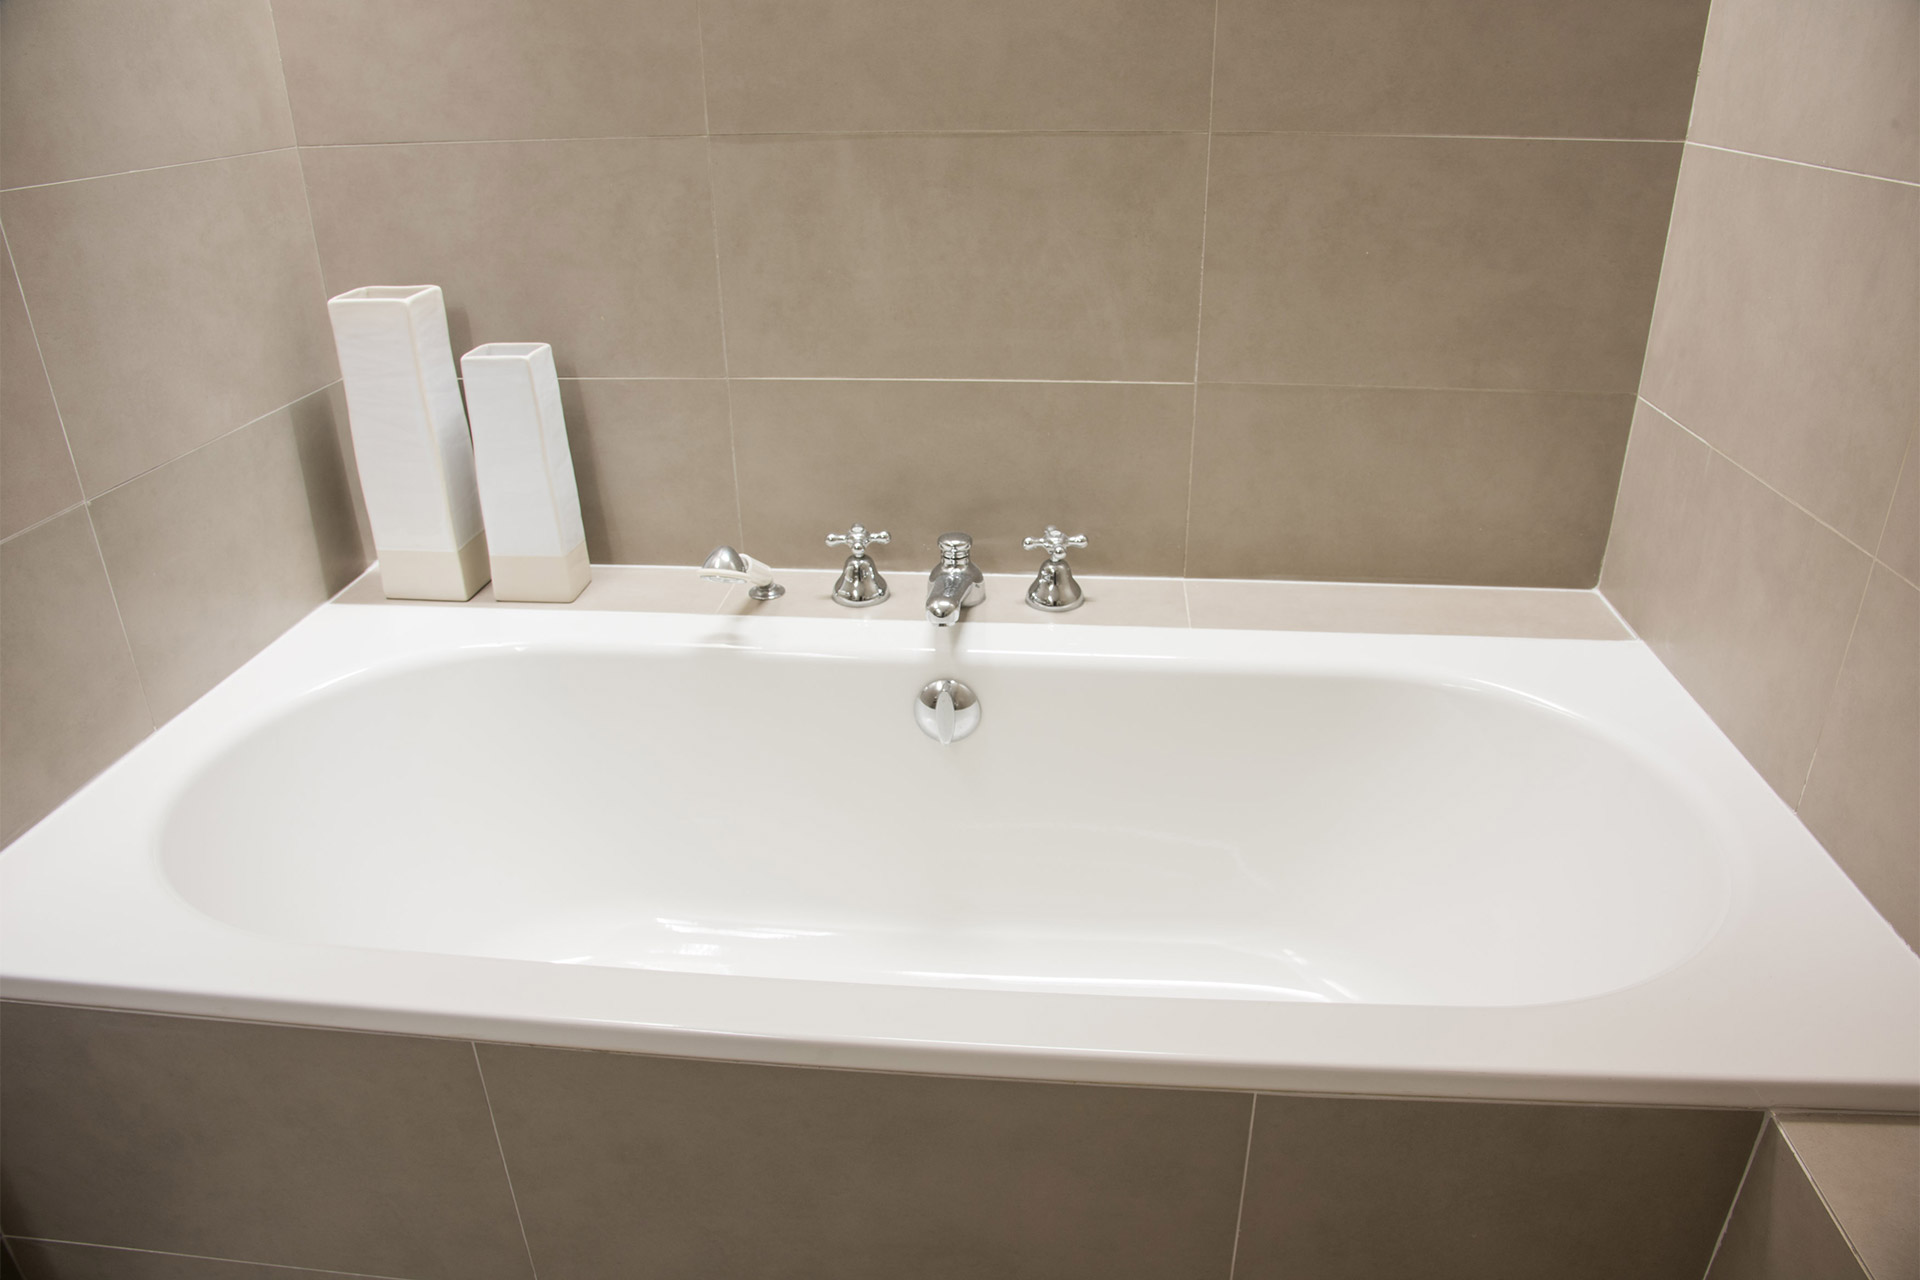 Bathtub with handheld shower